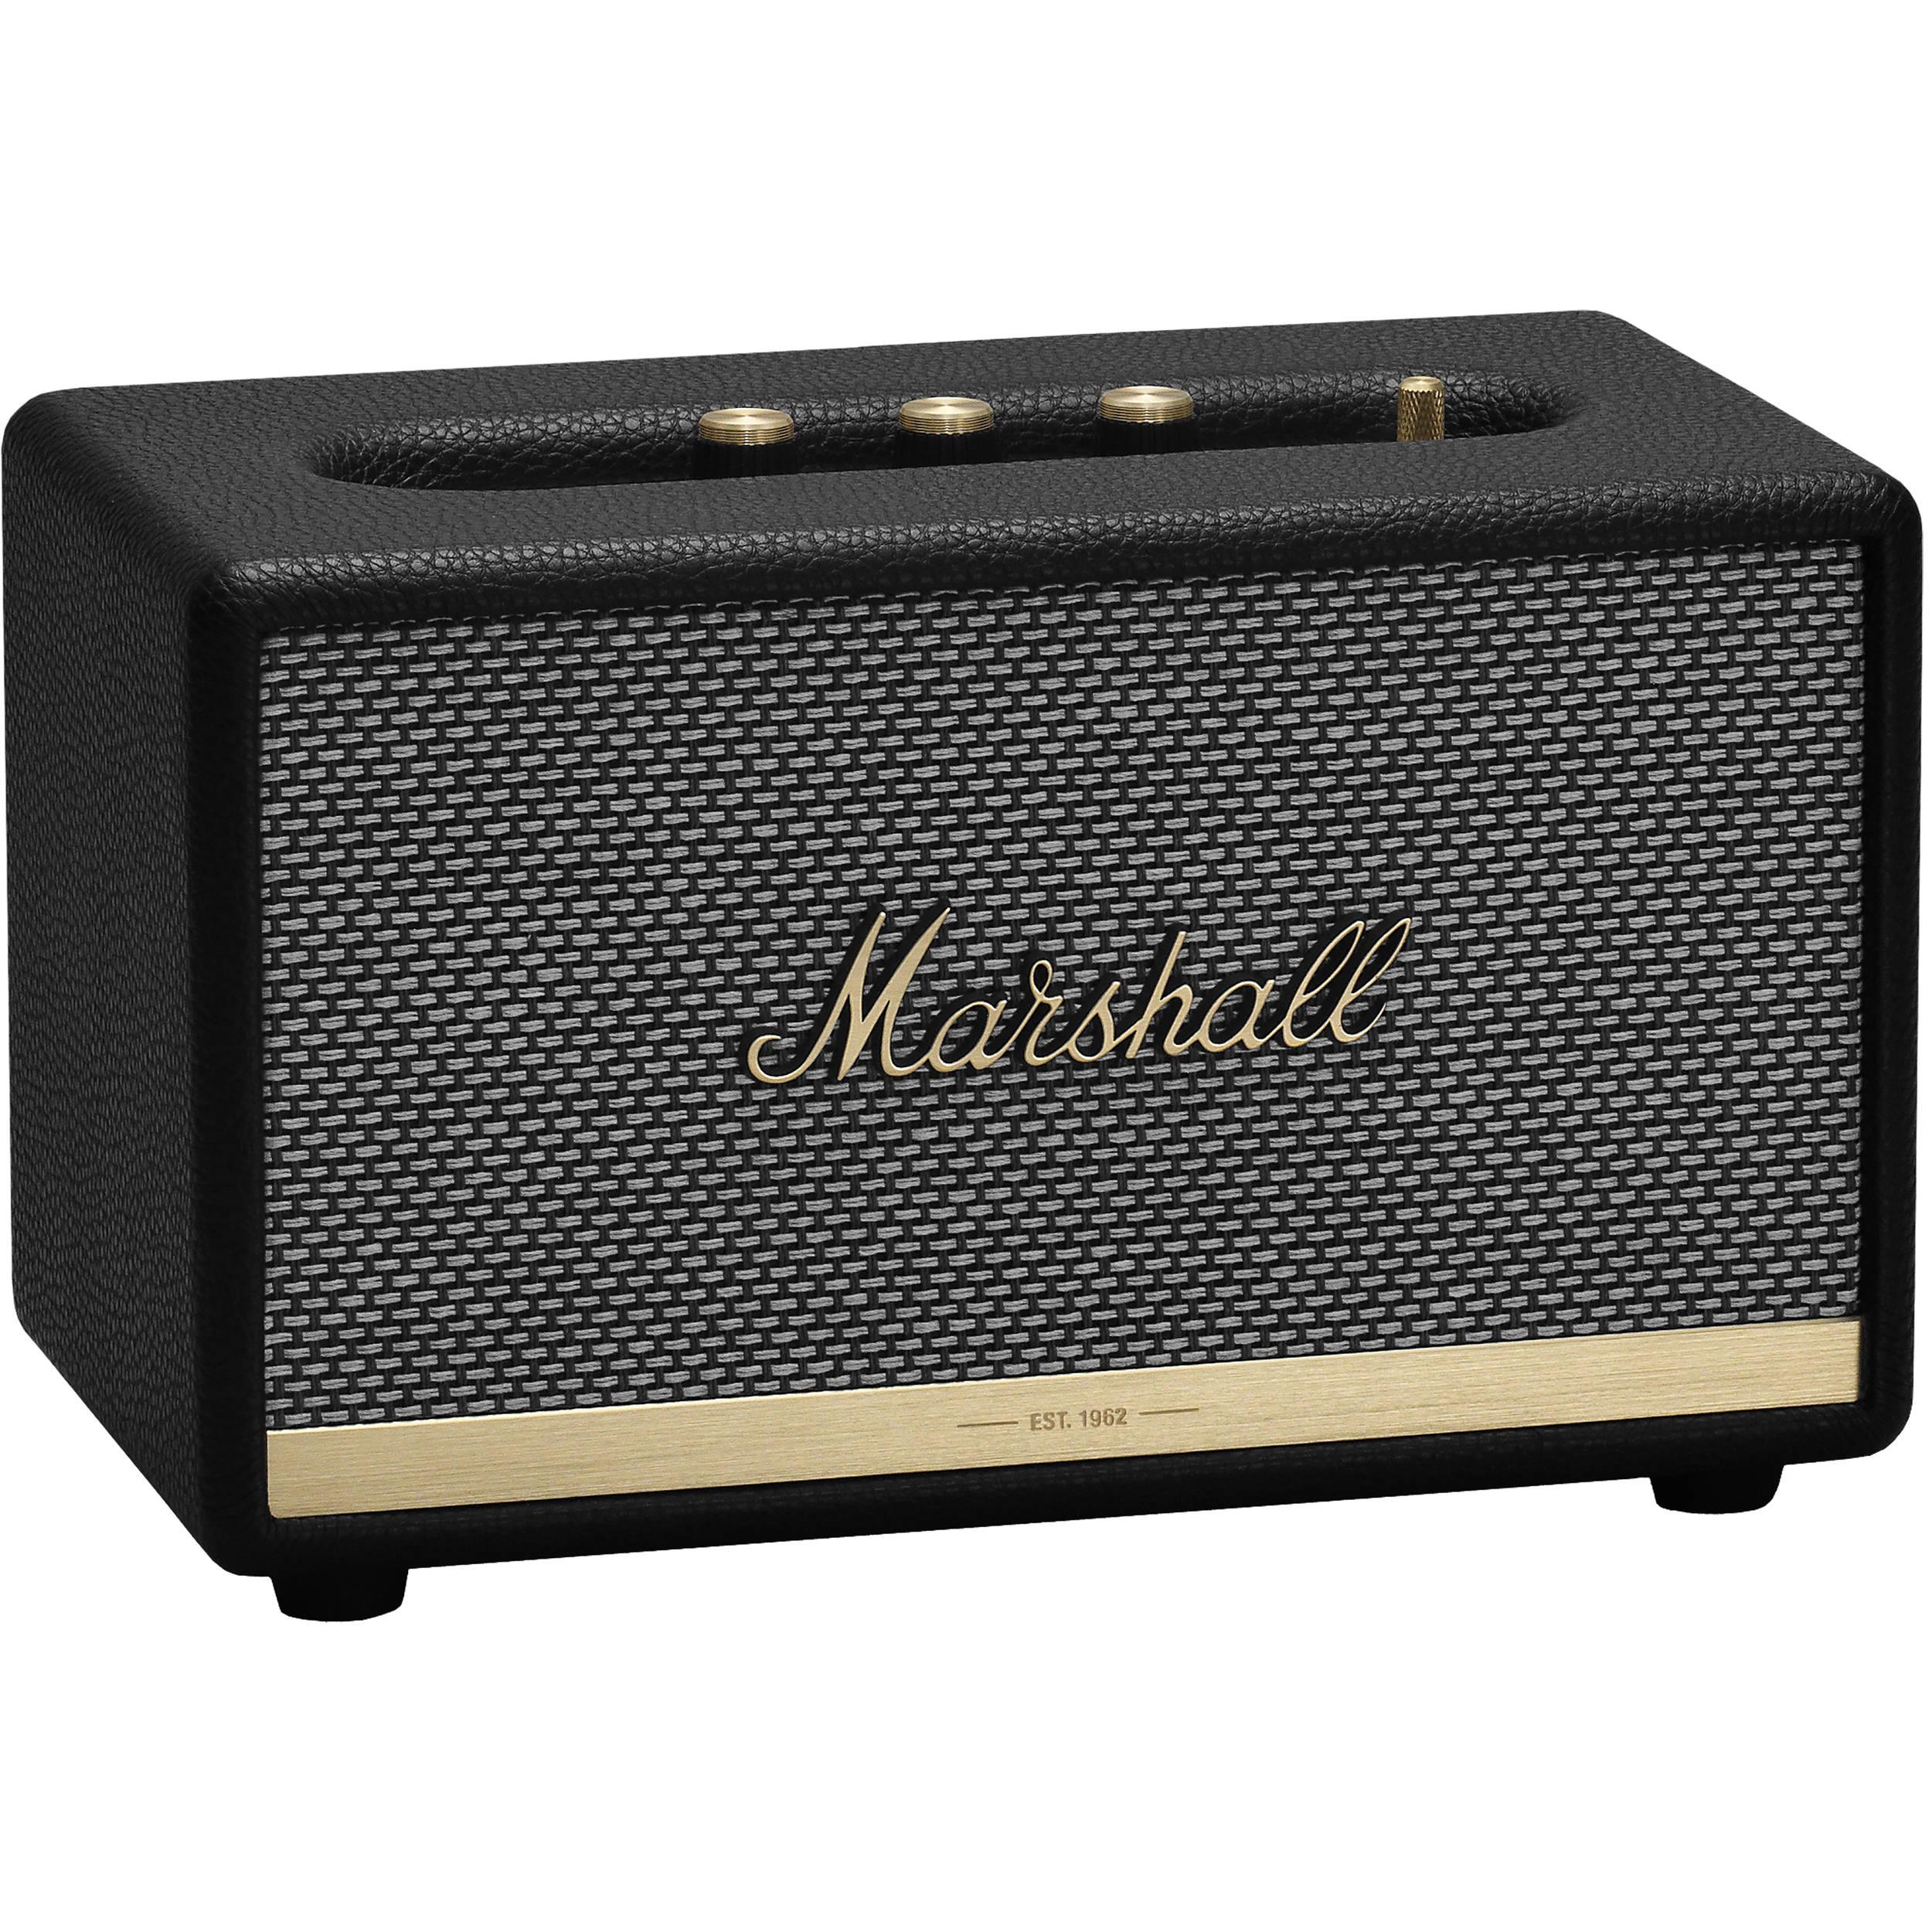 Black Marshall Acton Wireless Bluetooth Speaker System